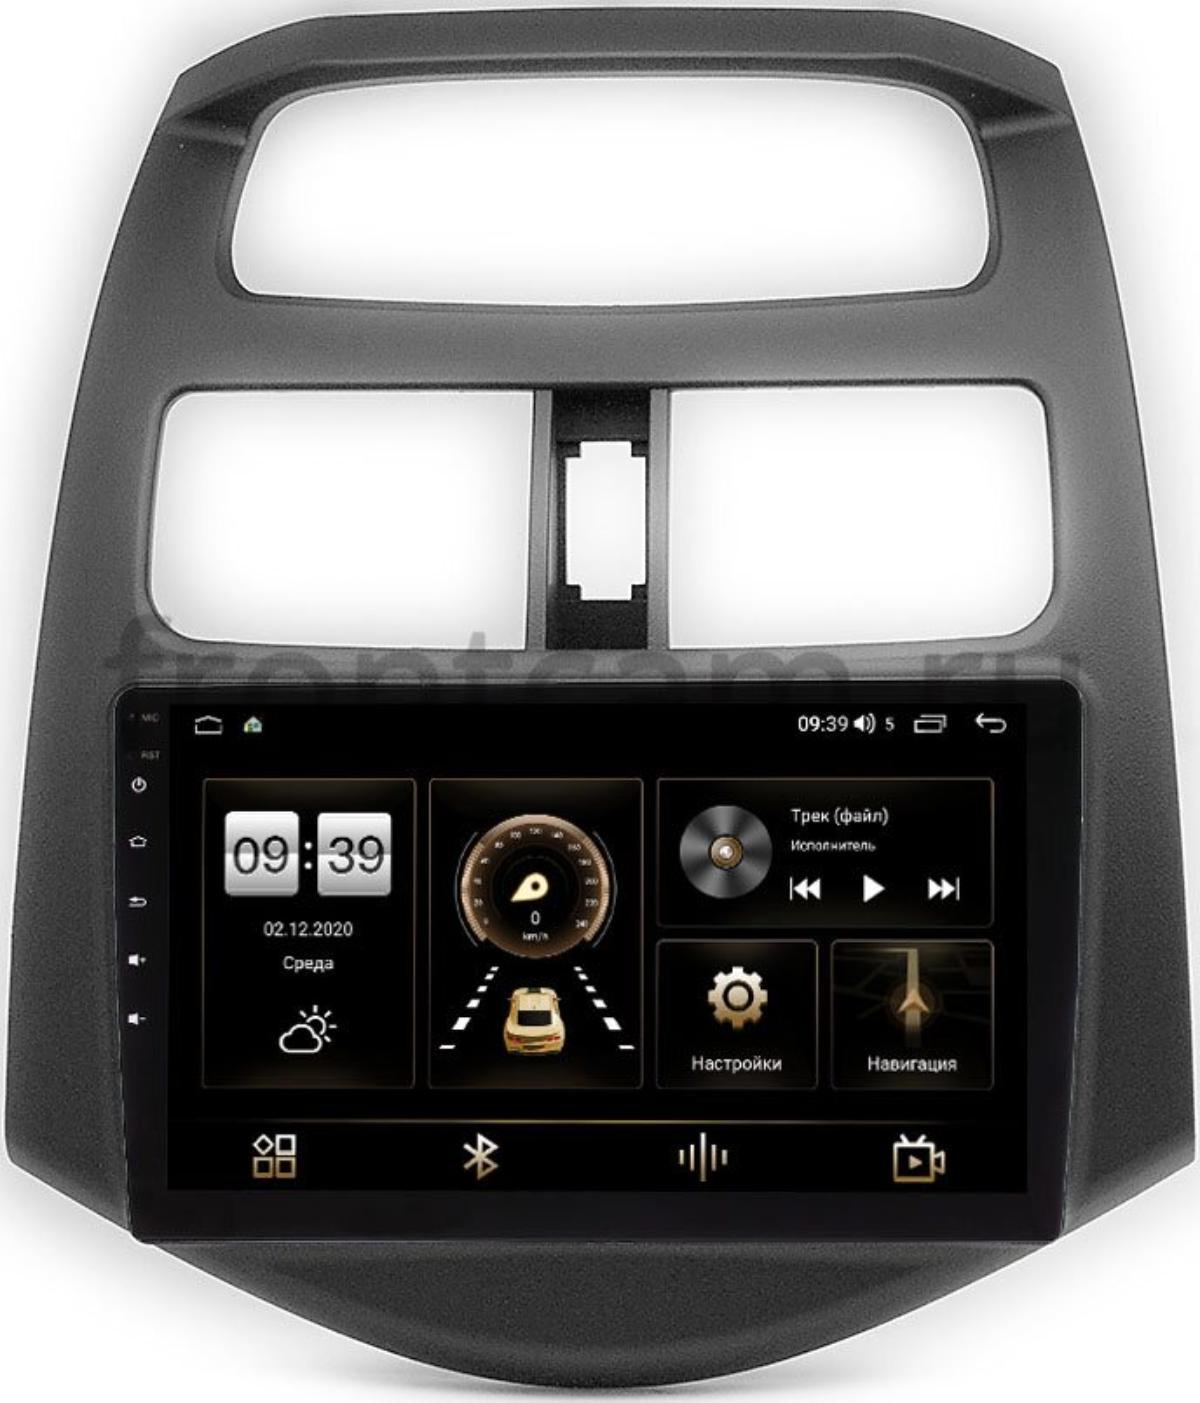 Штатная магнитола Chevrolet Spark III 2009-2016 (глянцевая) LeTrun 4166-9164 на Android 10 (4G-SIM, 3/32, DSP, QLed) (+ Камера заднего вида в подарок!)